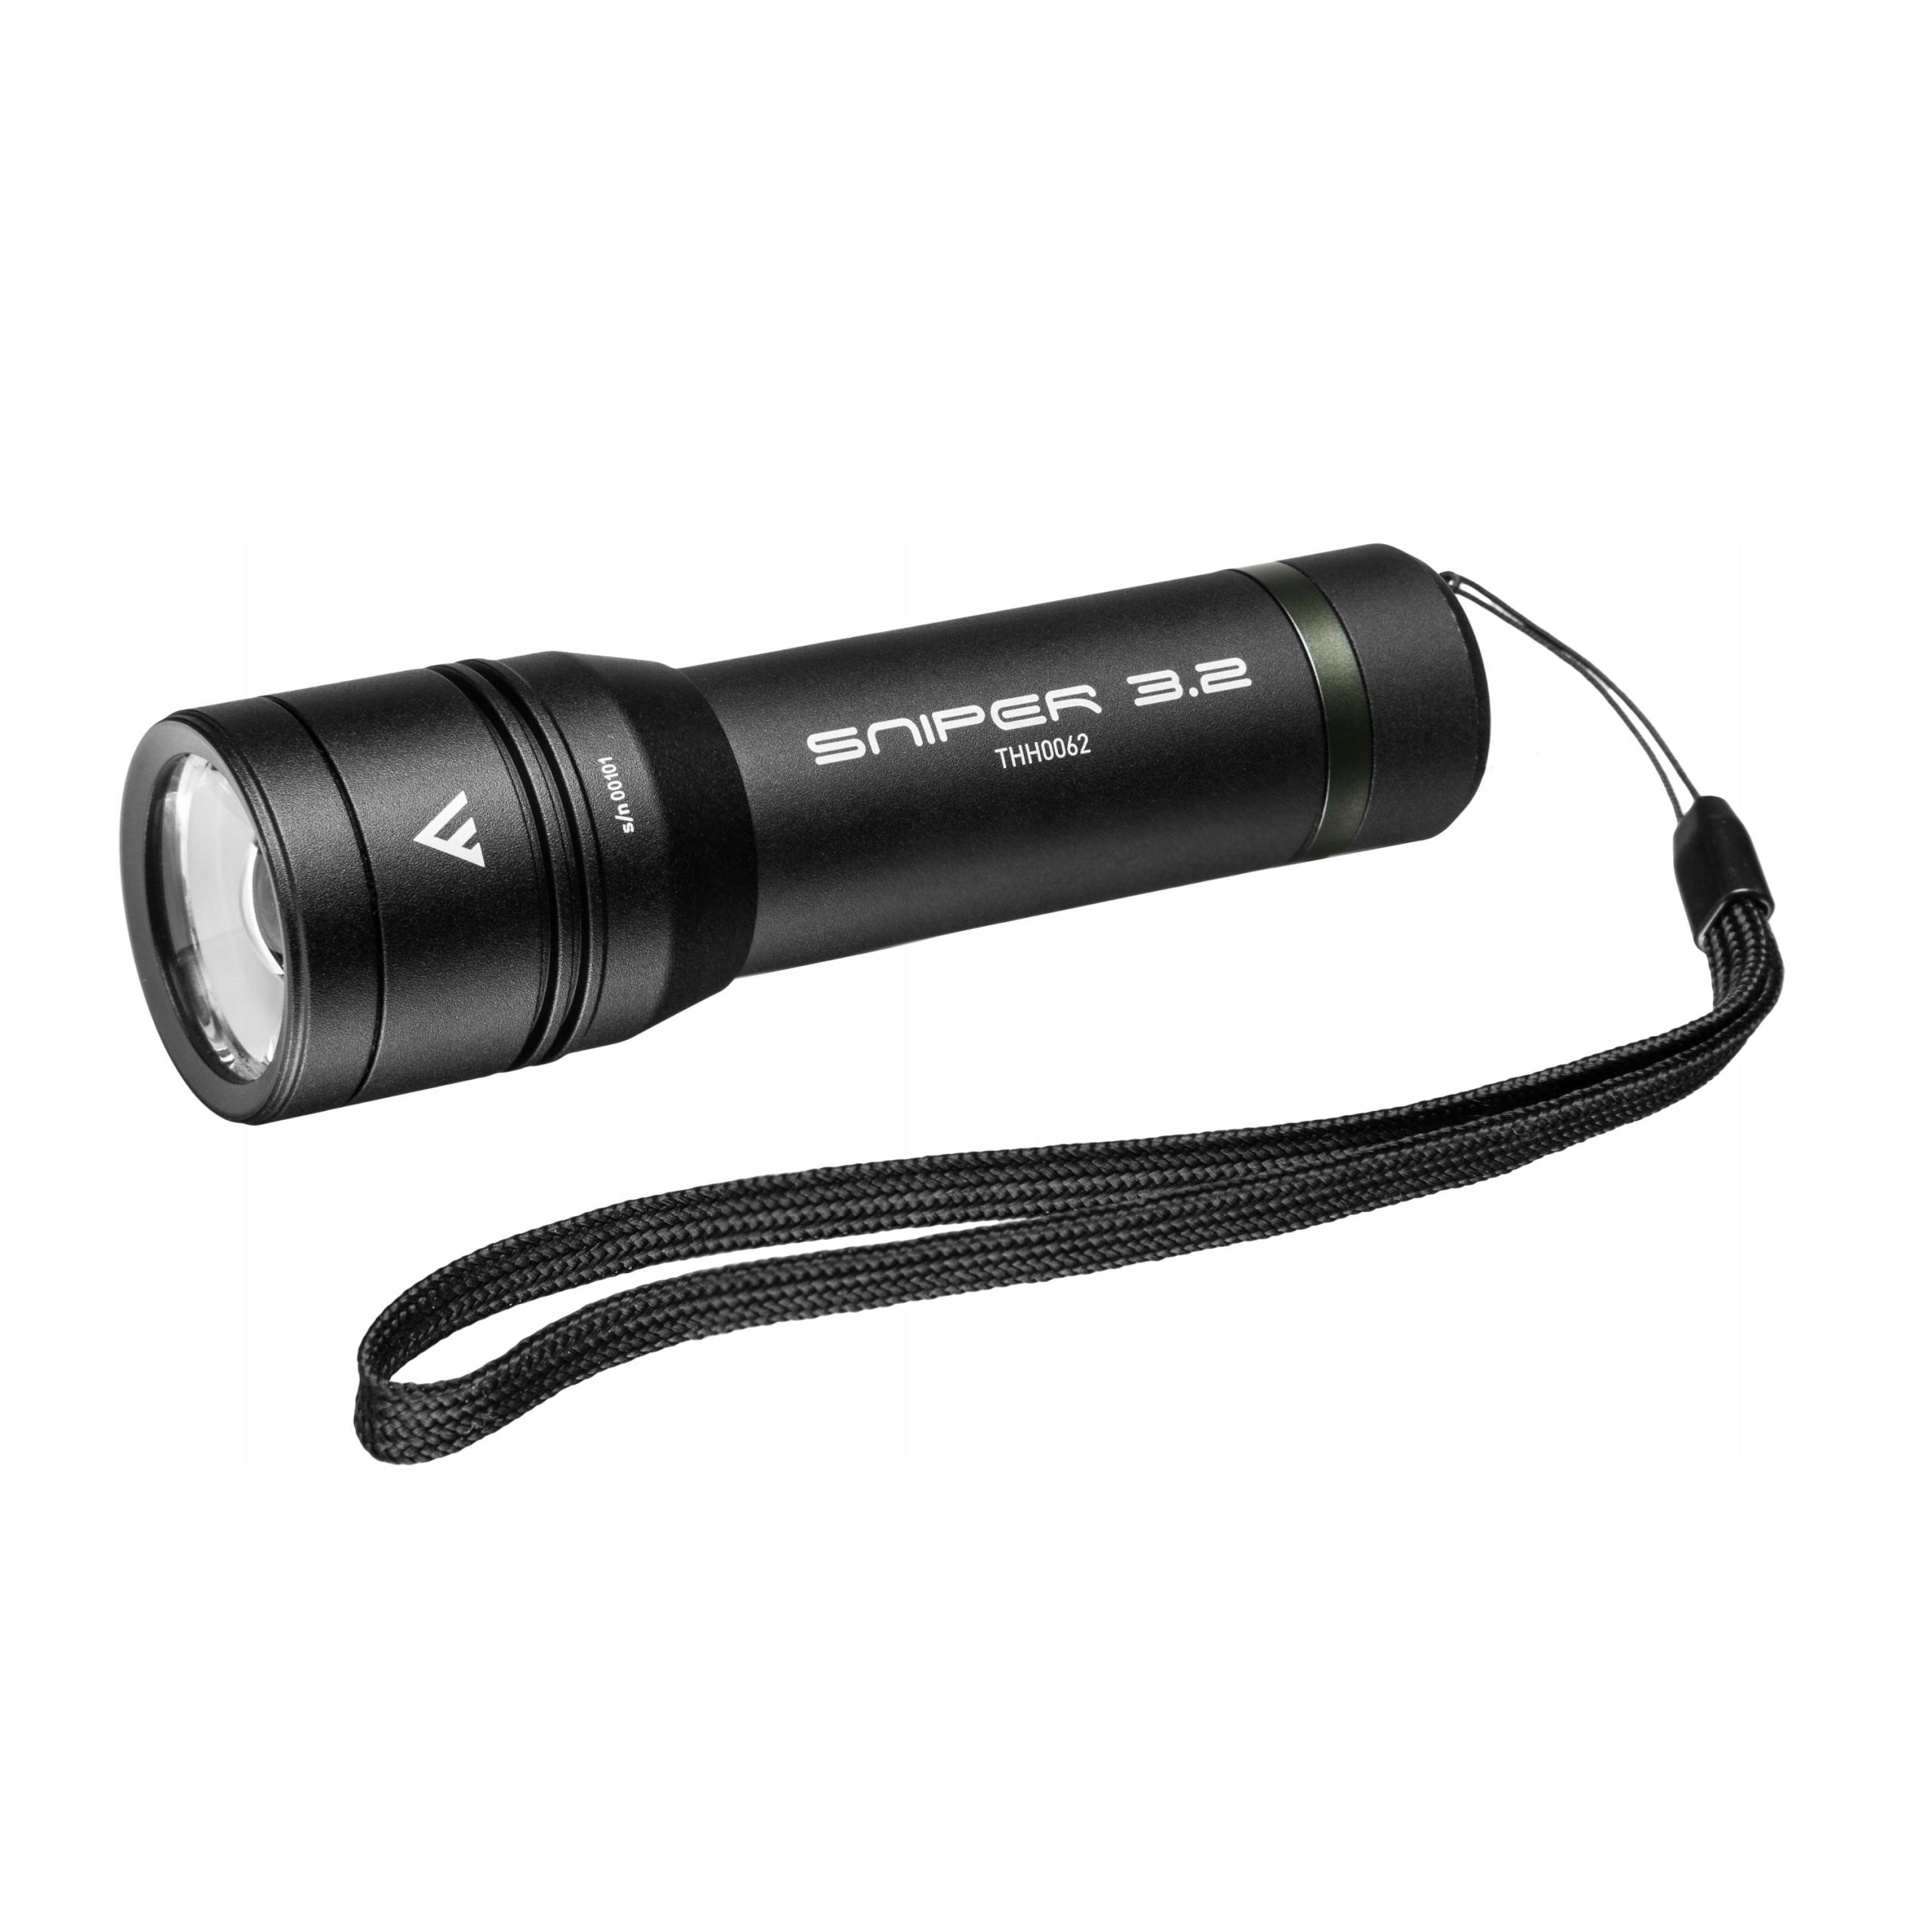 Mactronic Sniper 3.2 Baterka hliadky LED 420 lm